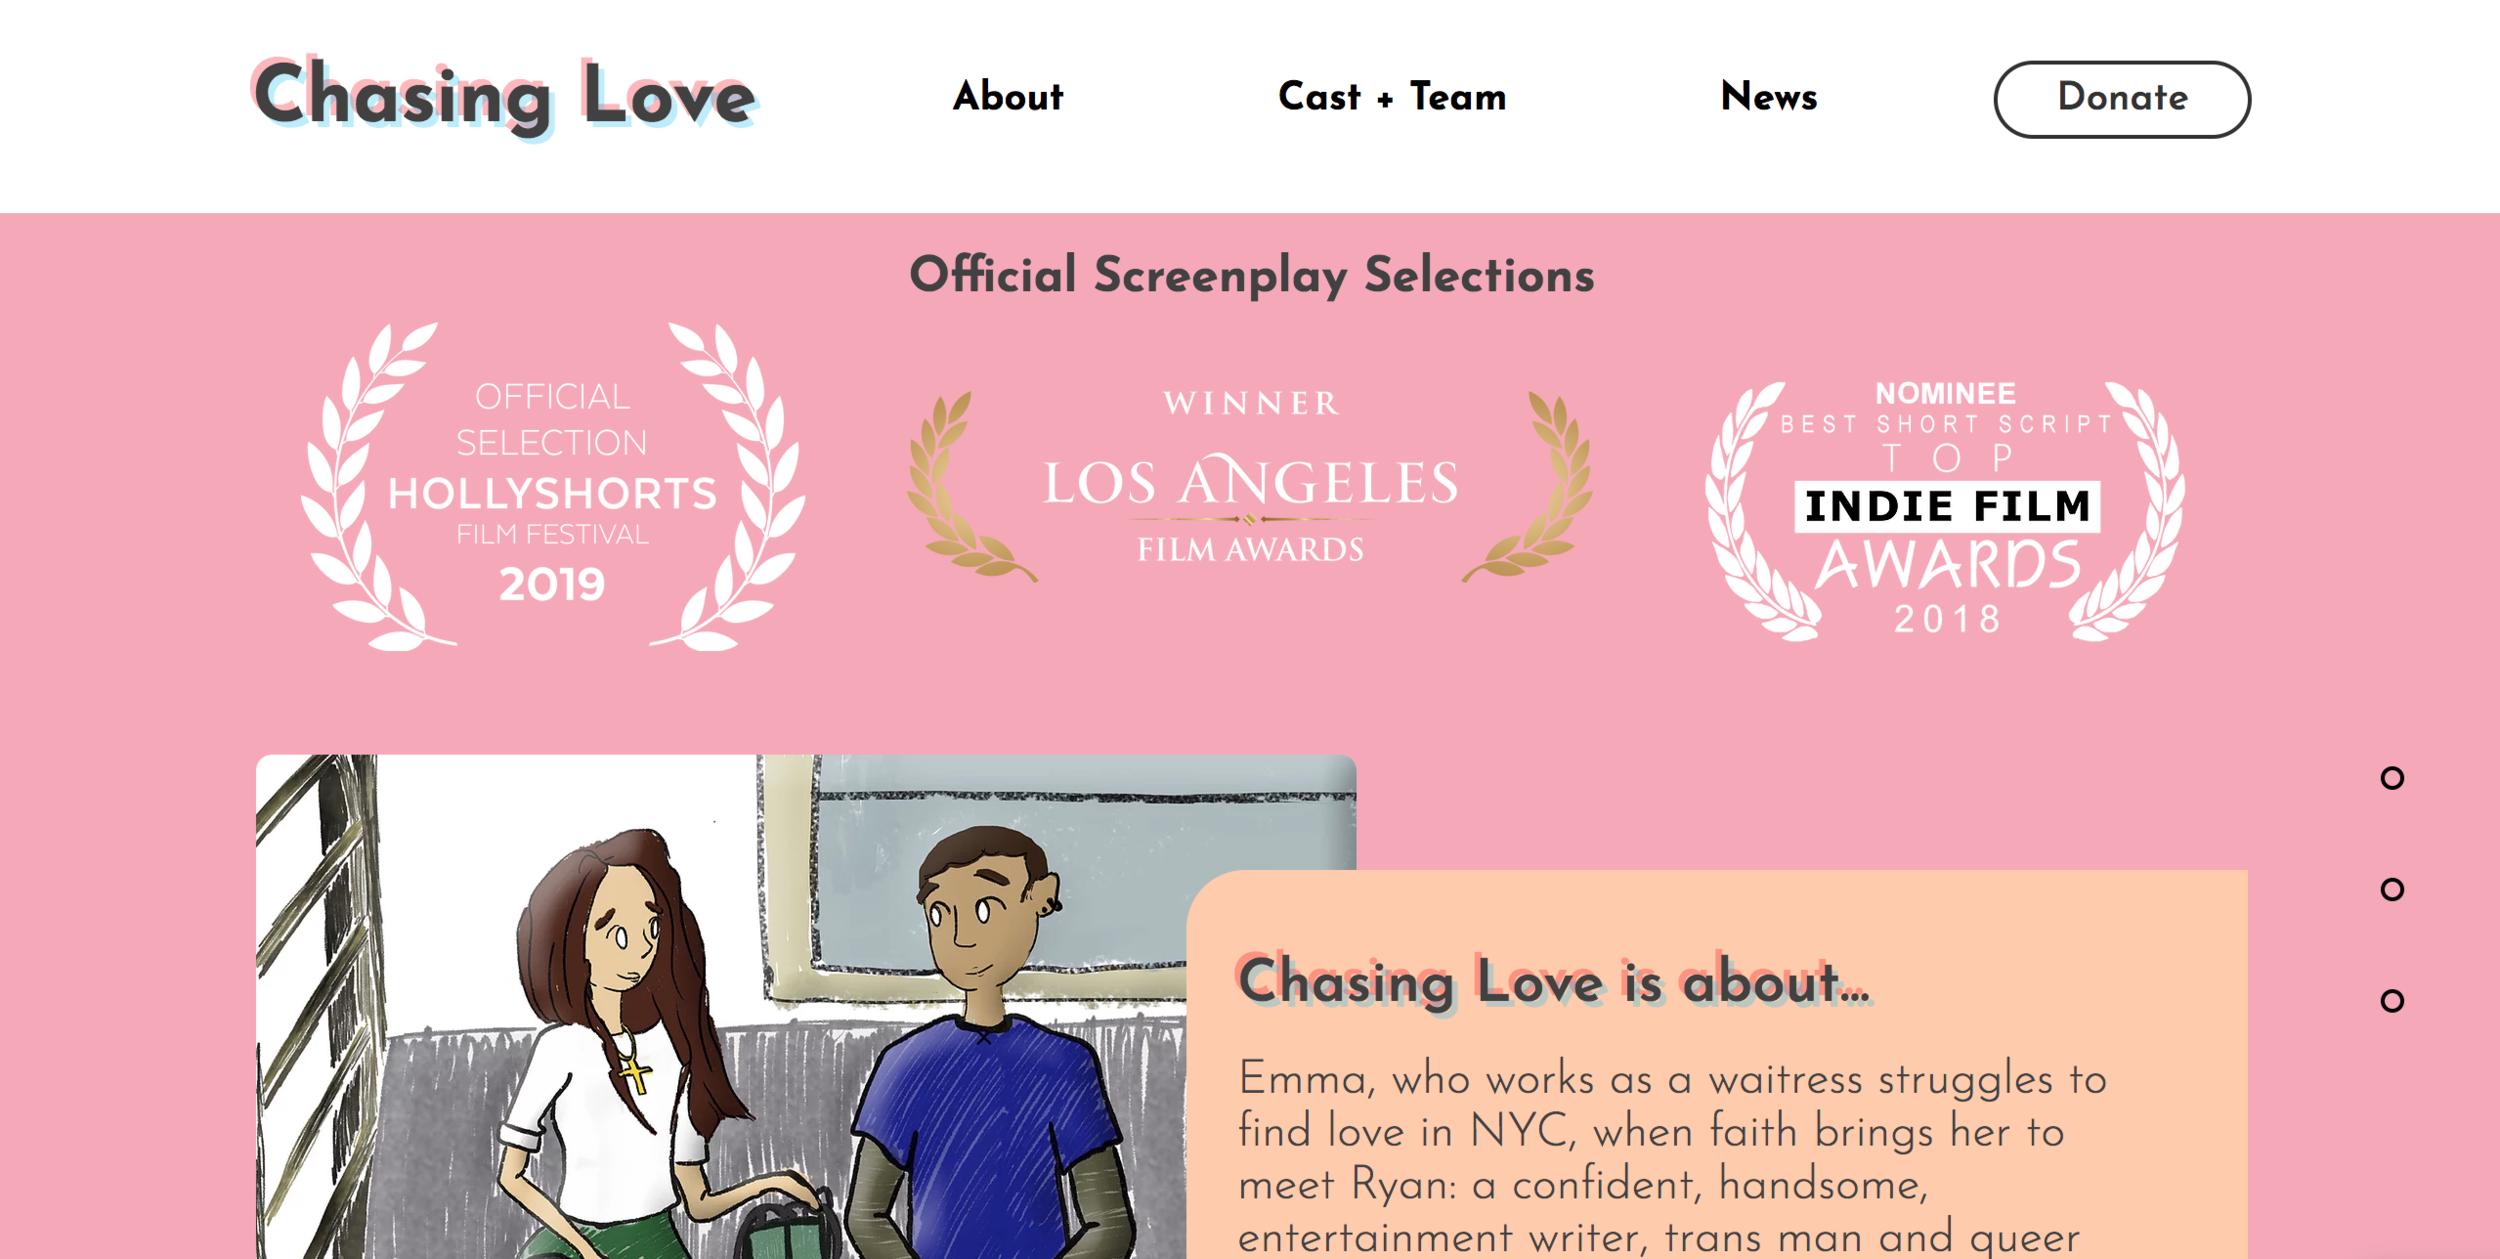 chasing love website